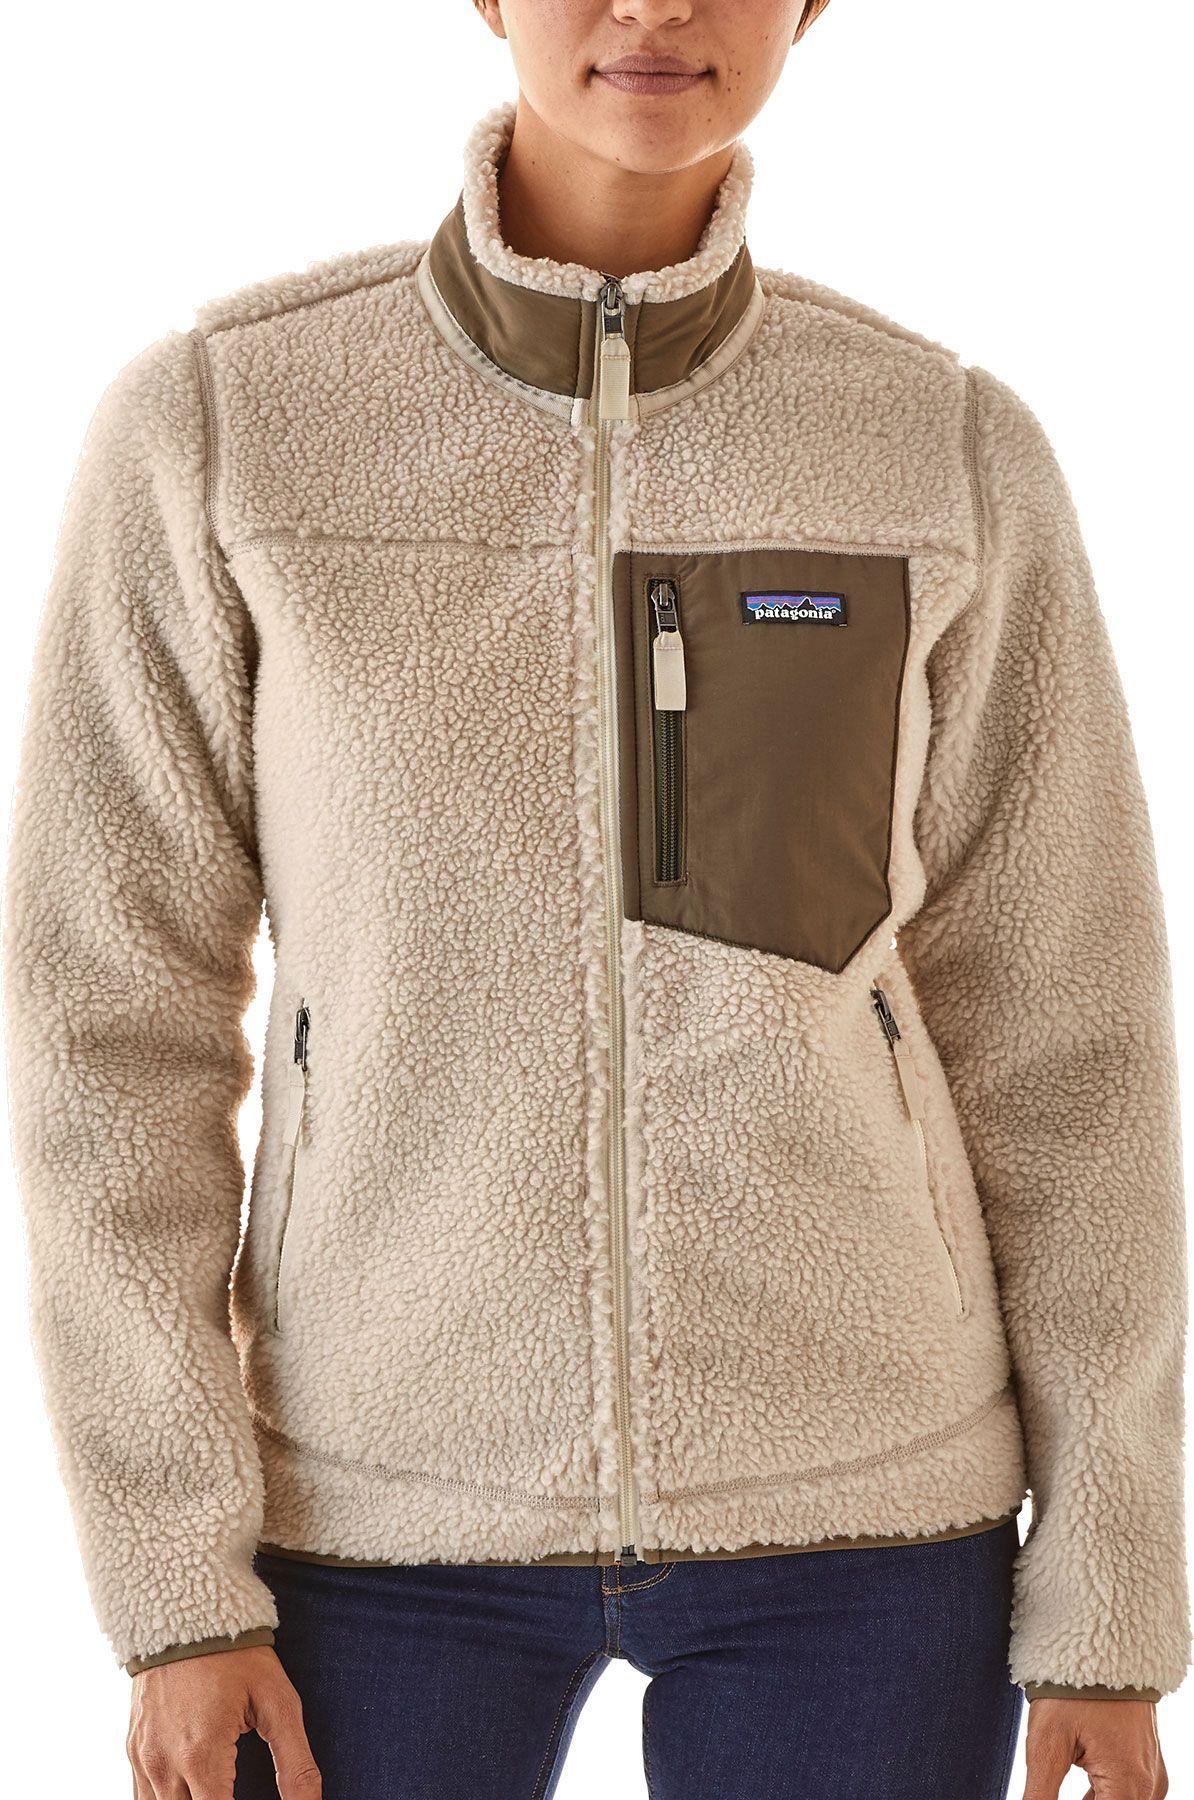 c51aaecb96 Patagonia Women s Classic Retro-X Fleece Jacket